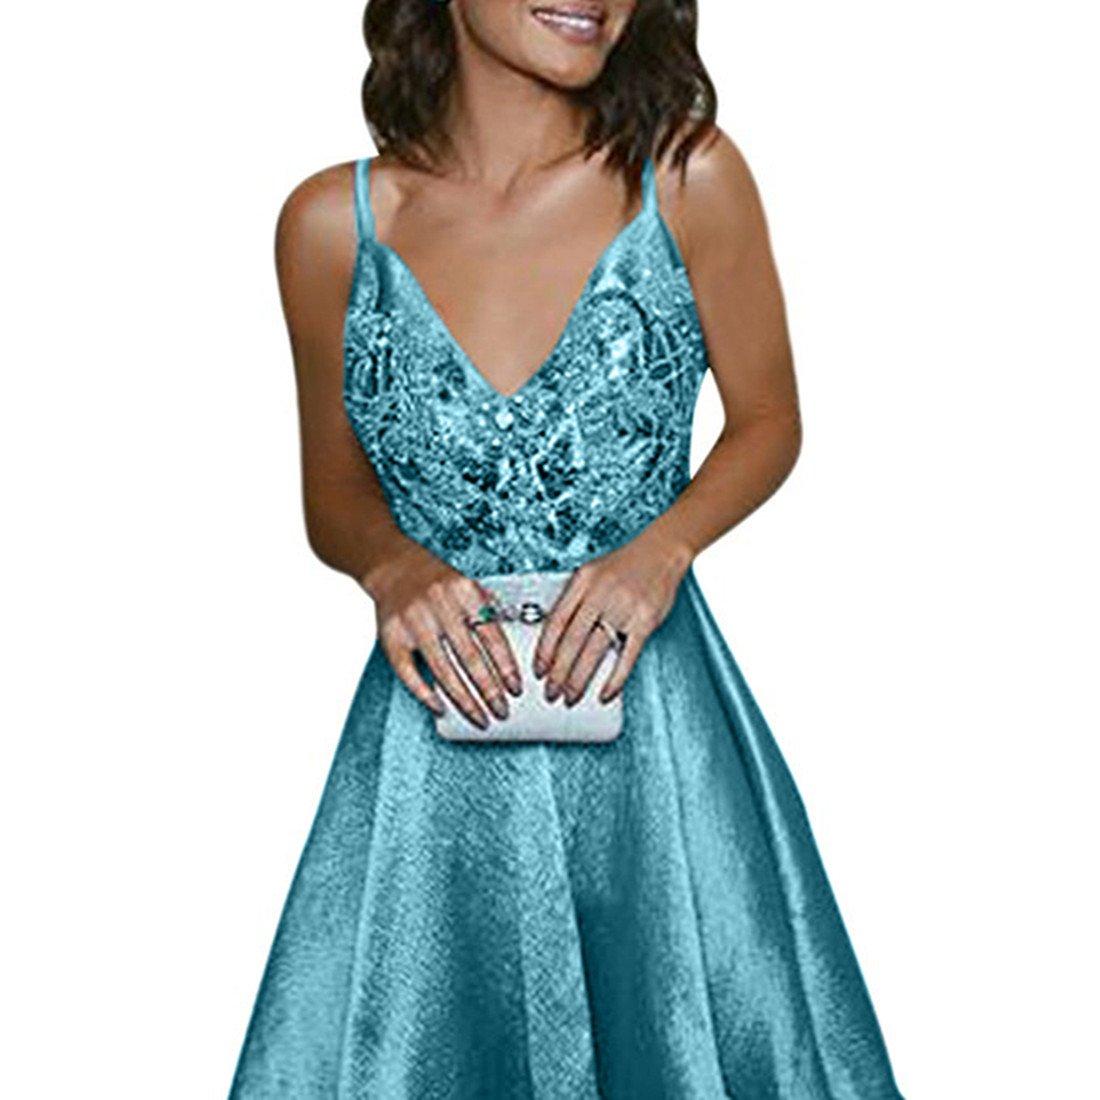 Formal Dresses for Professional Women